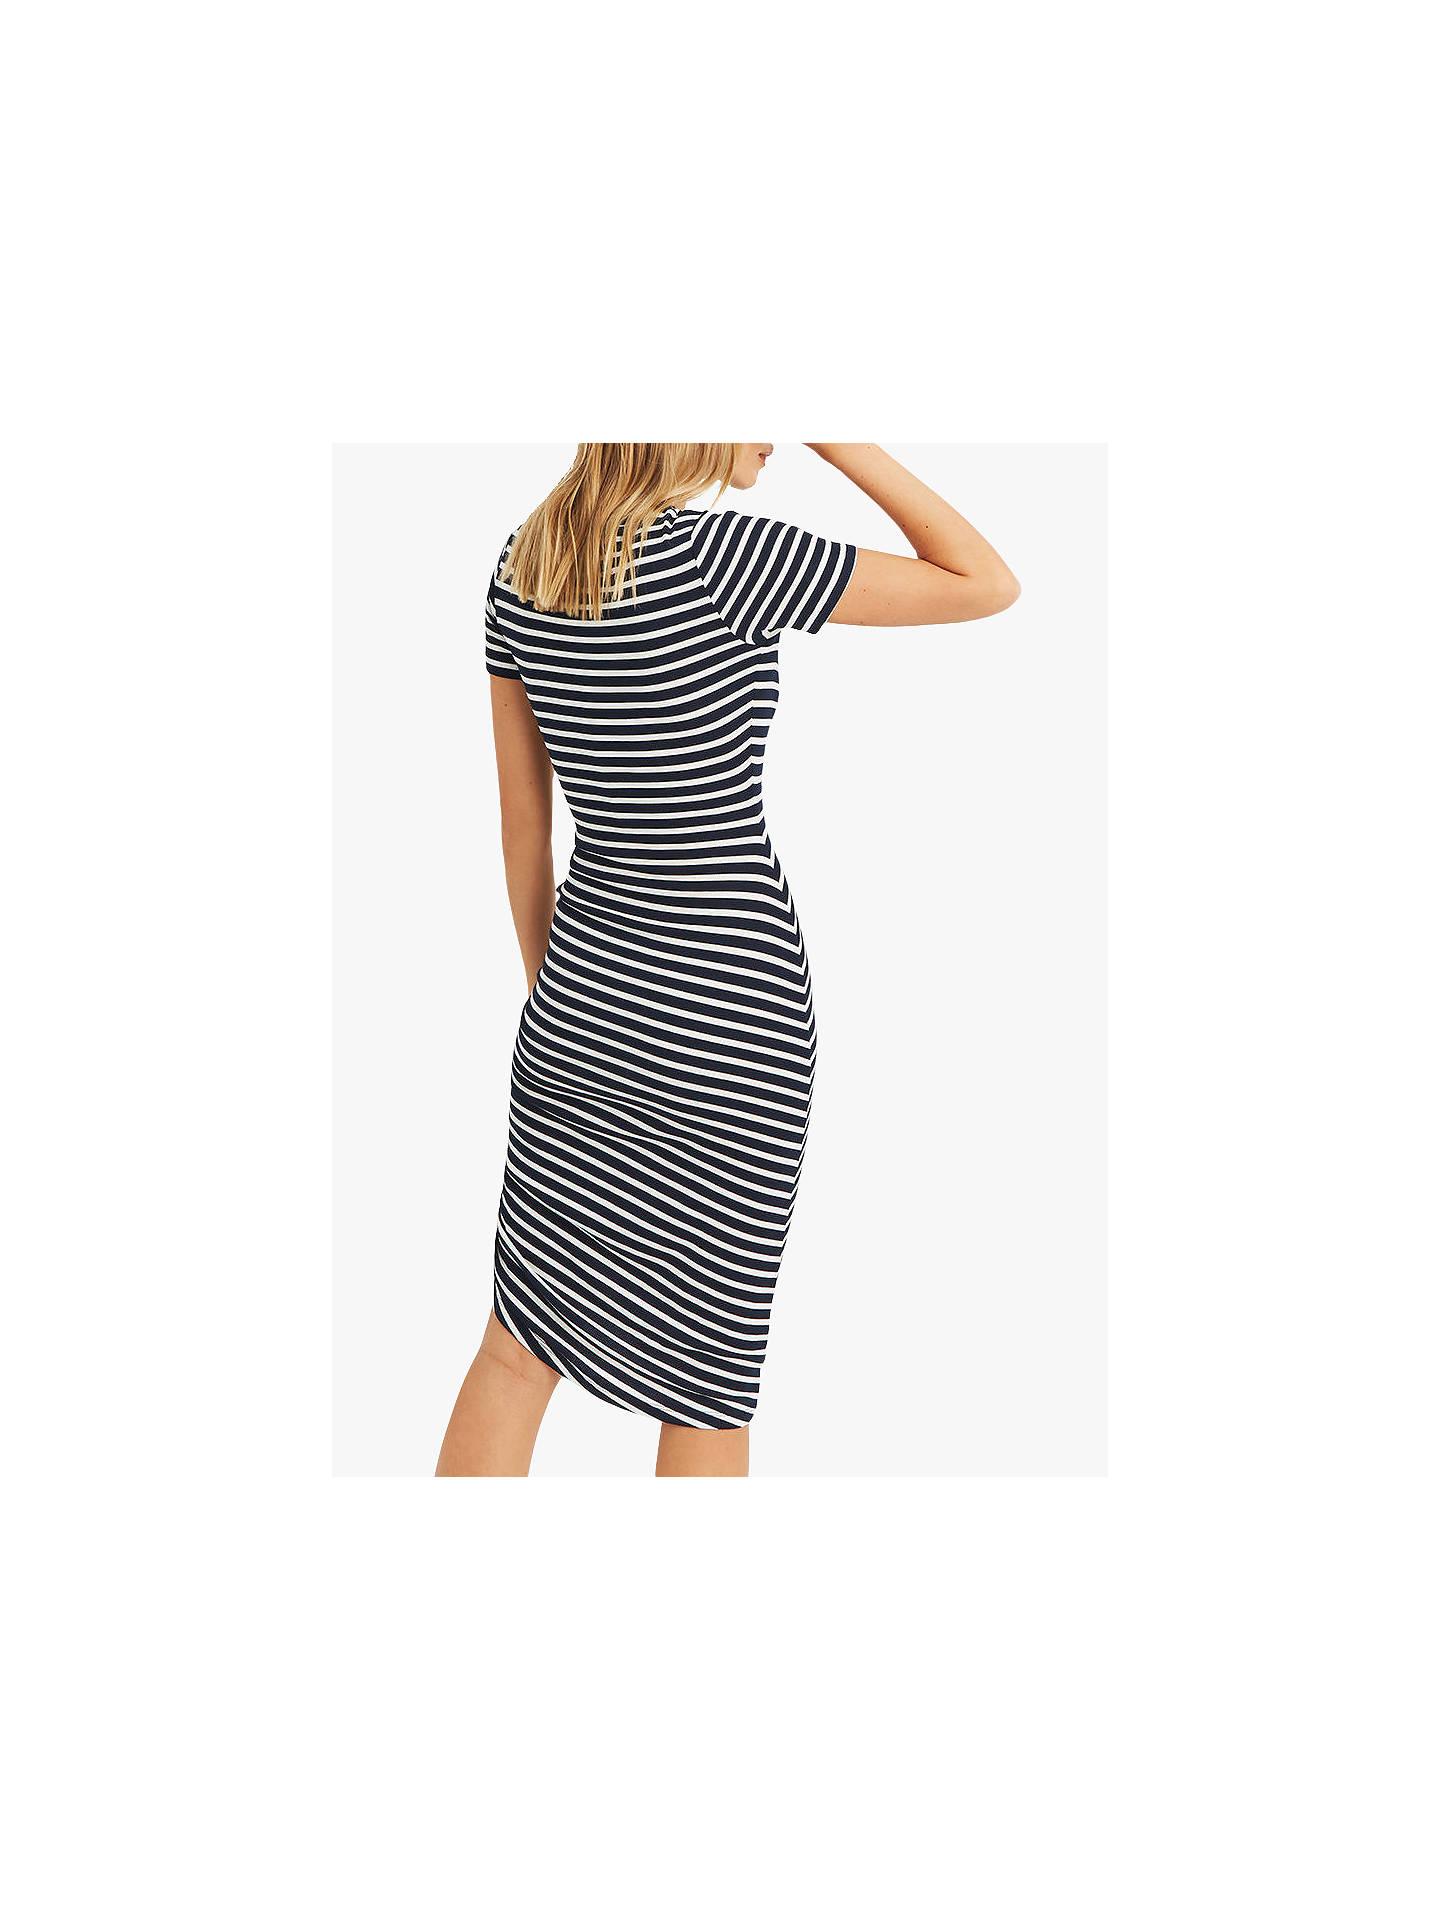 08540b5e1988 ... Buy Oasis Asymmetric Striped Jersey Dress, Multi, XL Online at  johnlewis.com ...